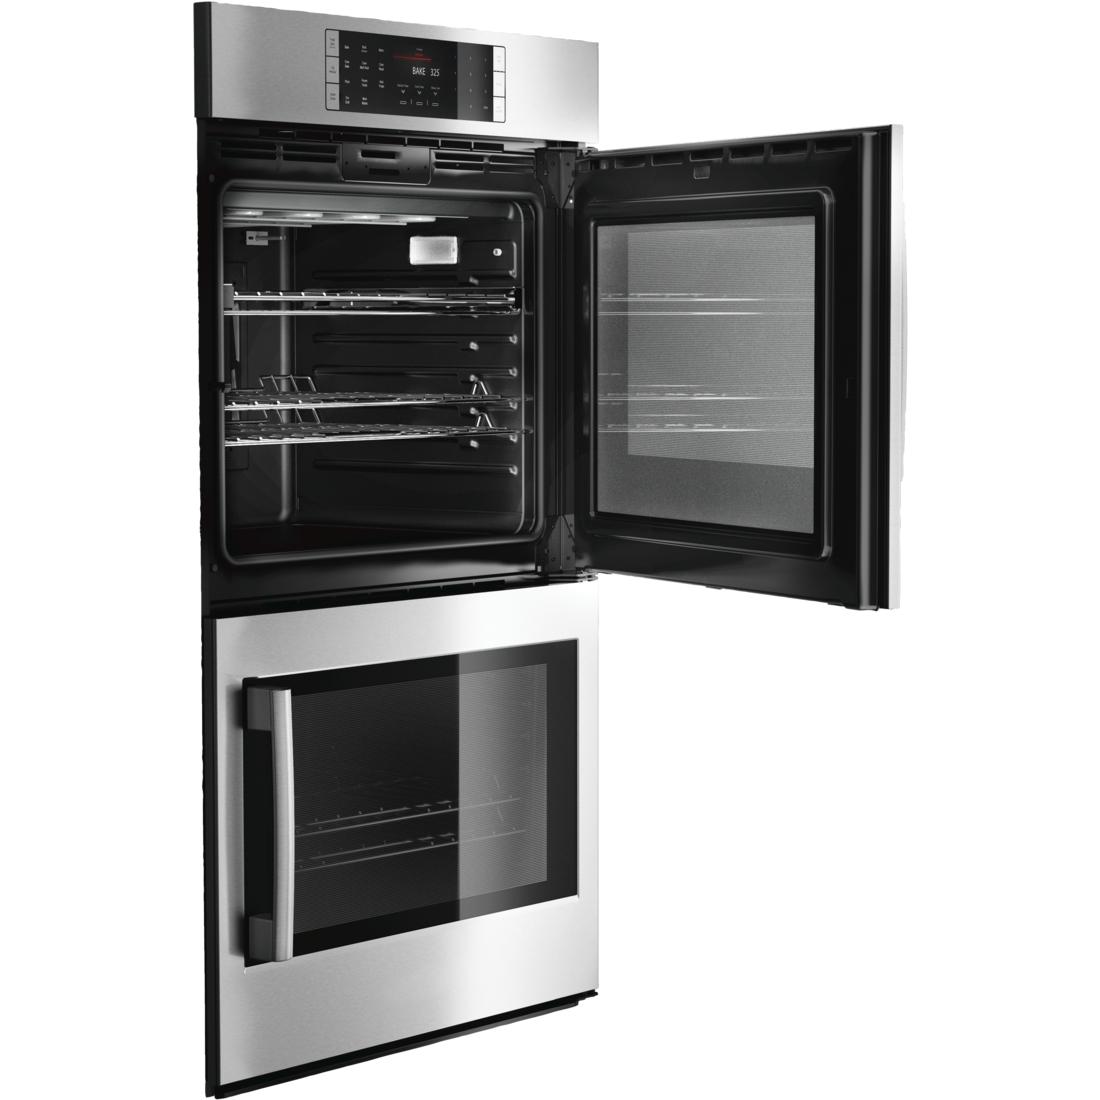 Cabanu_electrodomestico_MCSA00777640_Bosch-Double-Oven-HBLP651RUC-INTERIOR-Side-Opening-Door-Open_def.jpg